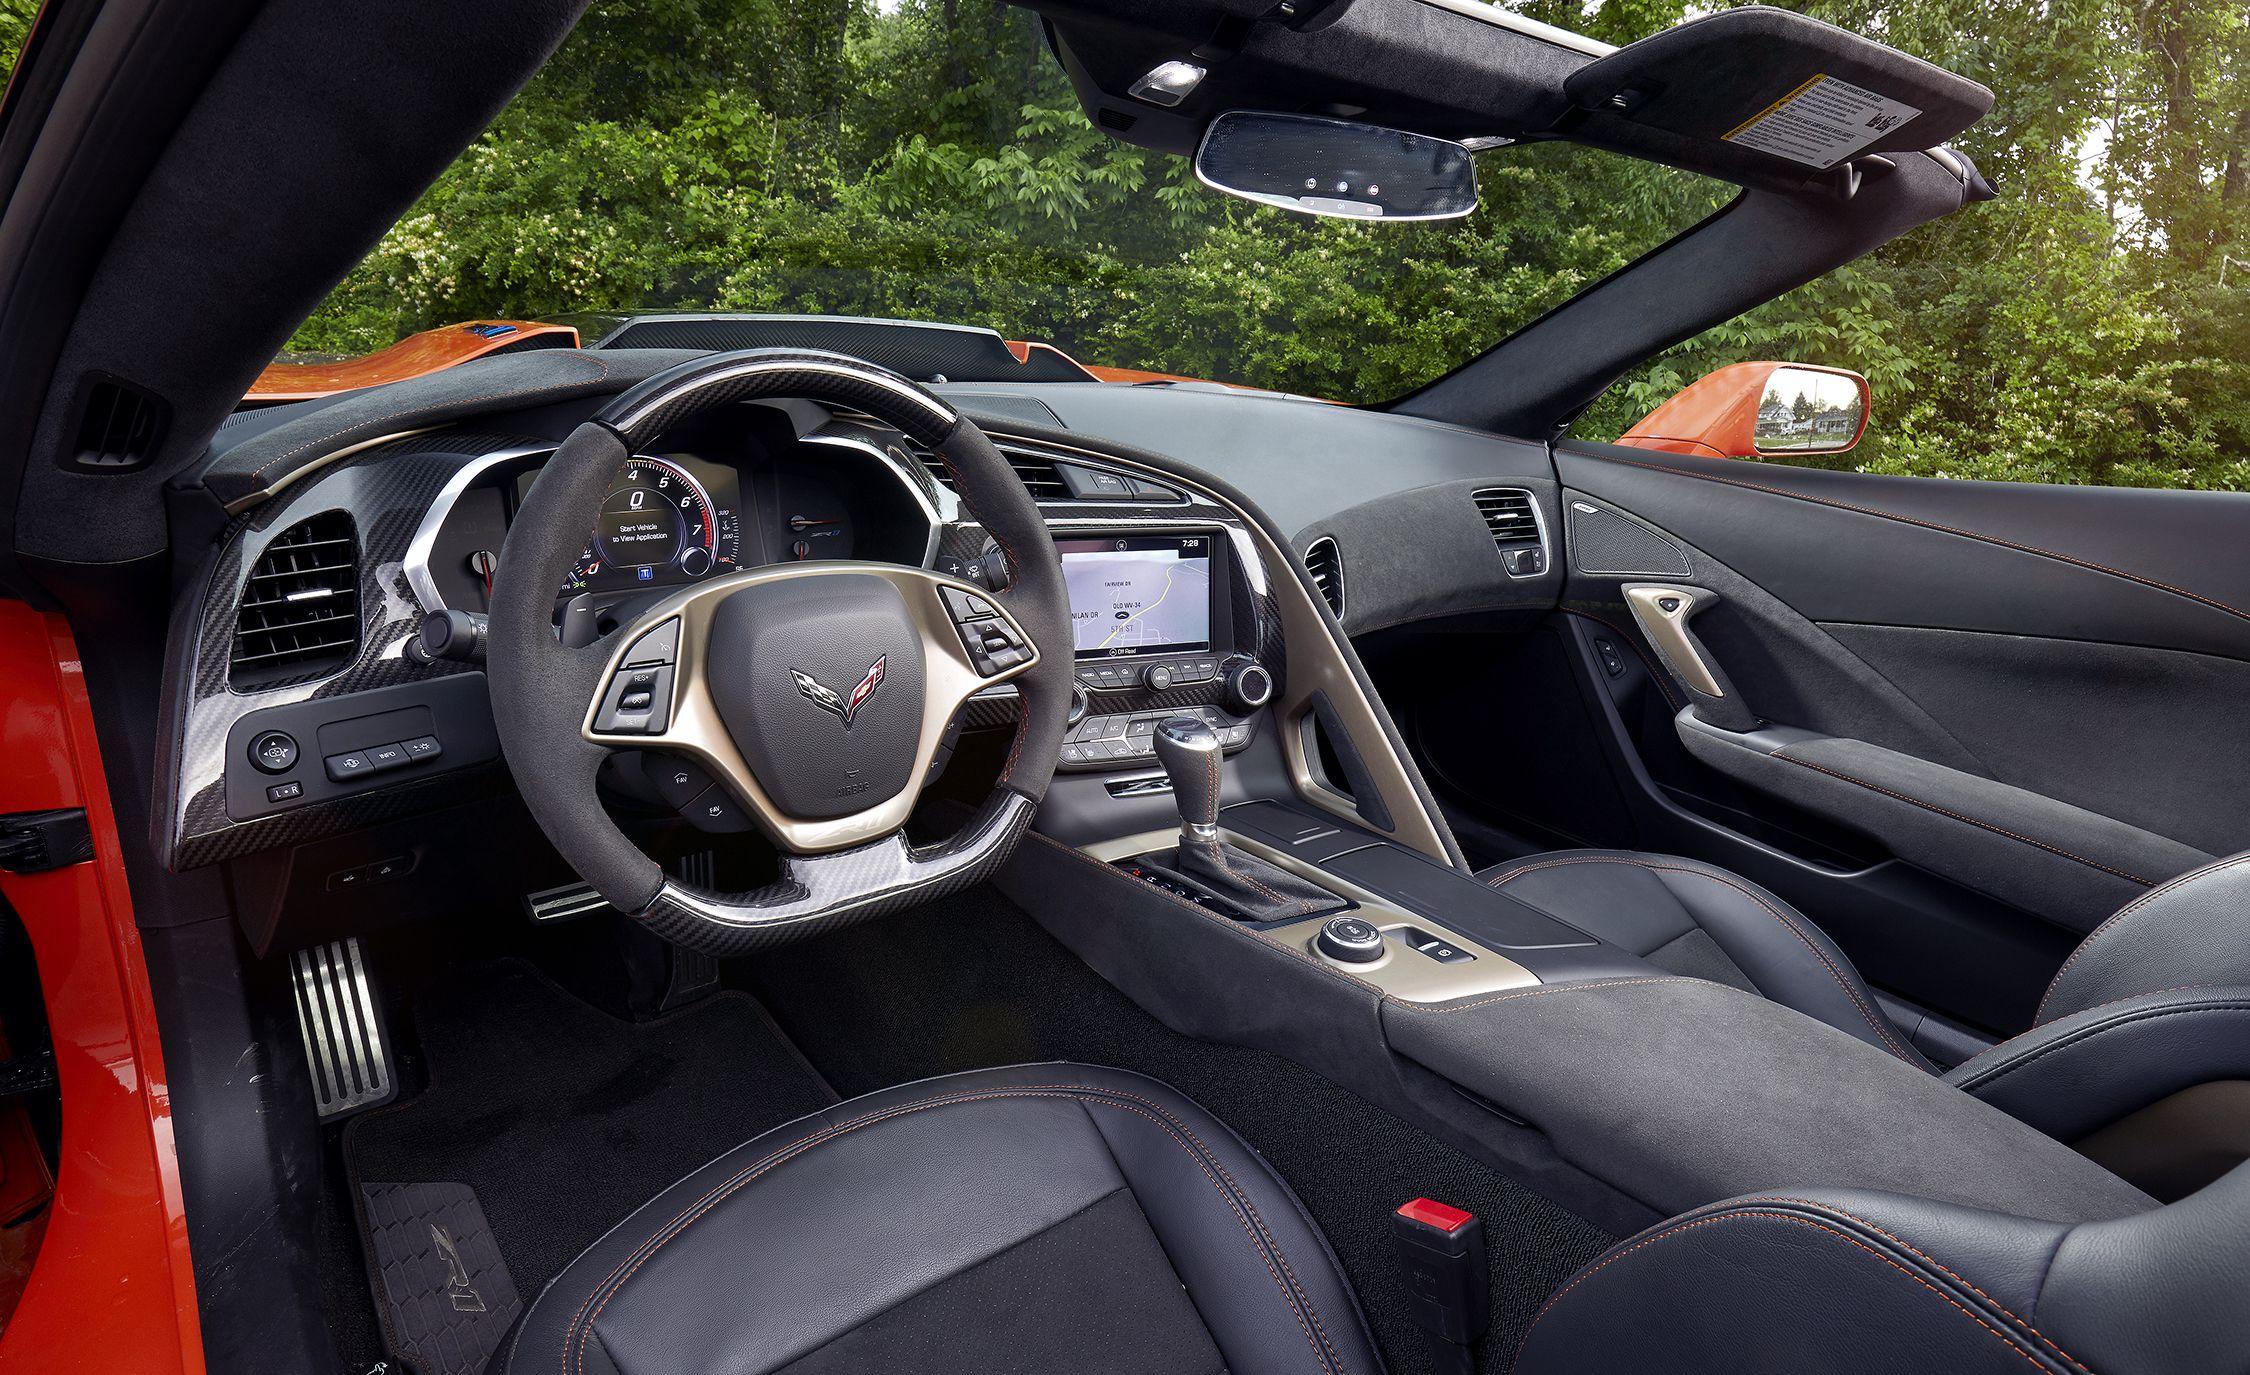 2019 Chevrolet Corvette ZR1 Interior Seats Wallpaper (14)